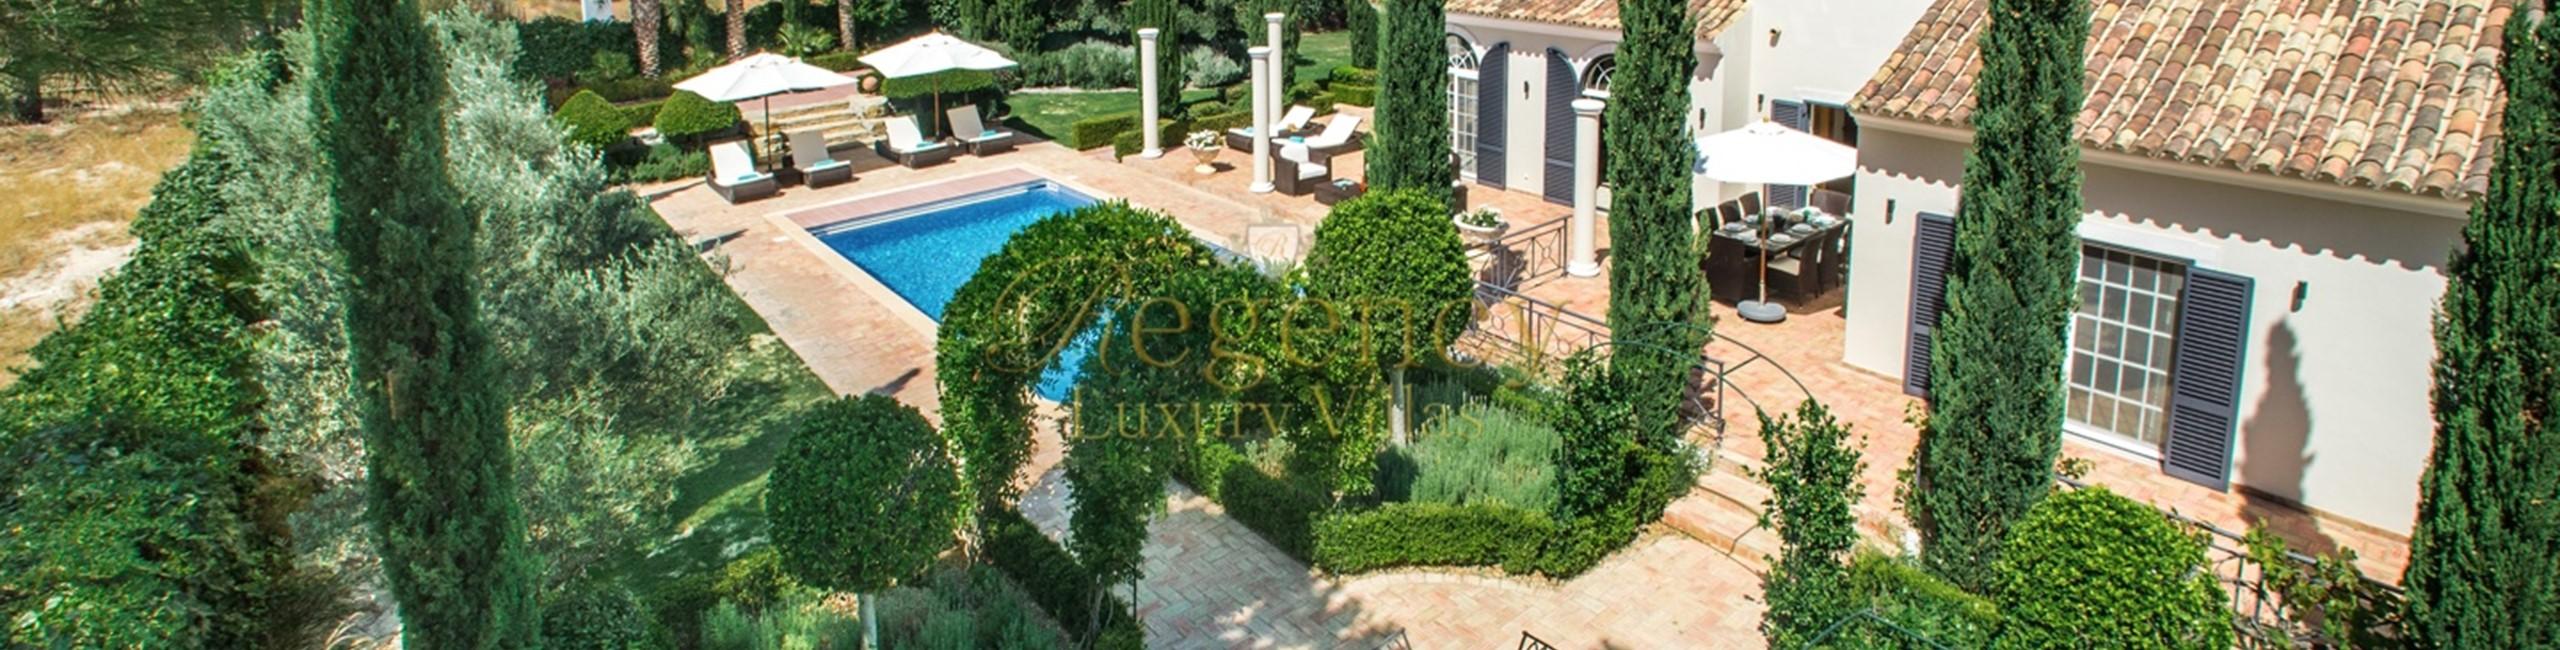 Villas To Rent 5 Bedroom In Quinta Do Lago Portugal